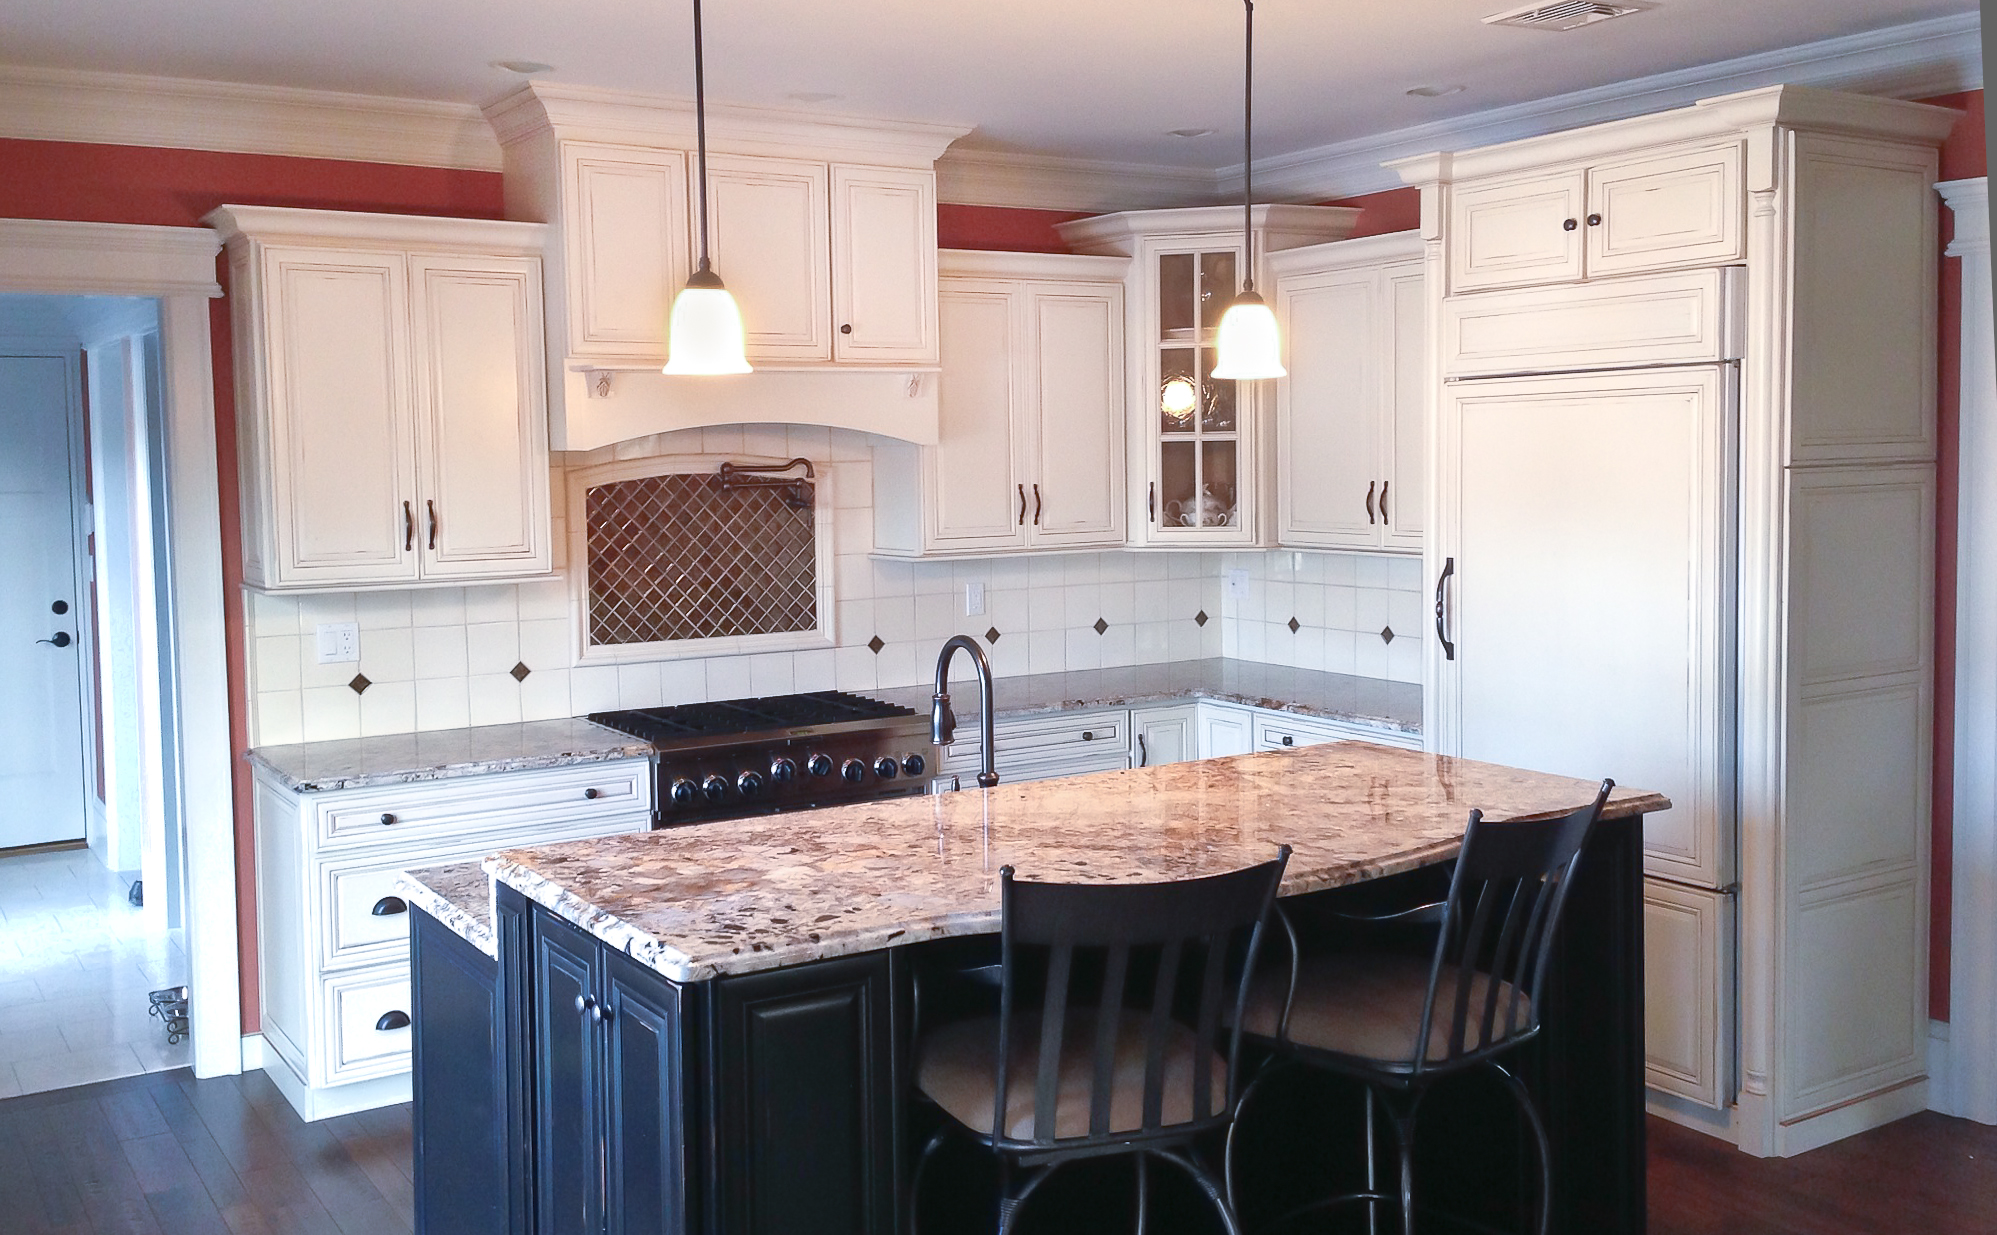 Kitchen_Renovation_Main (1 of 1).jpg